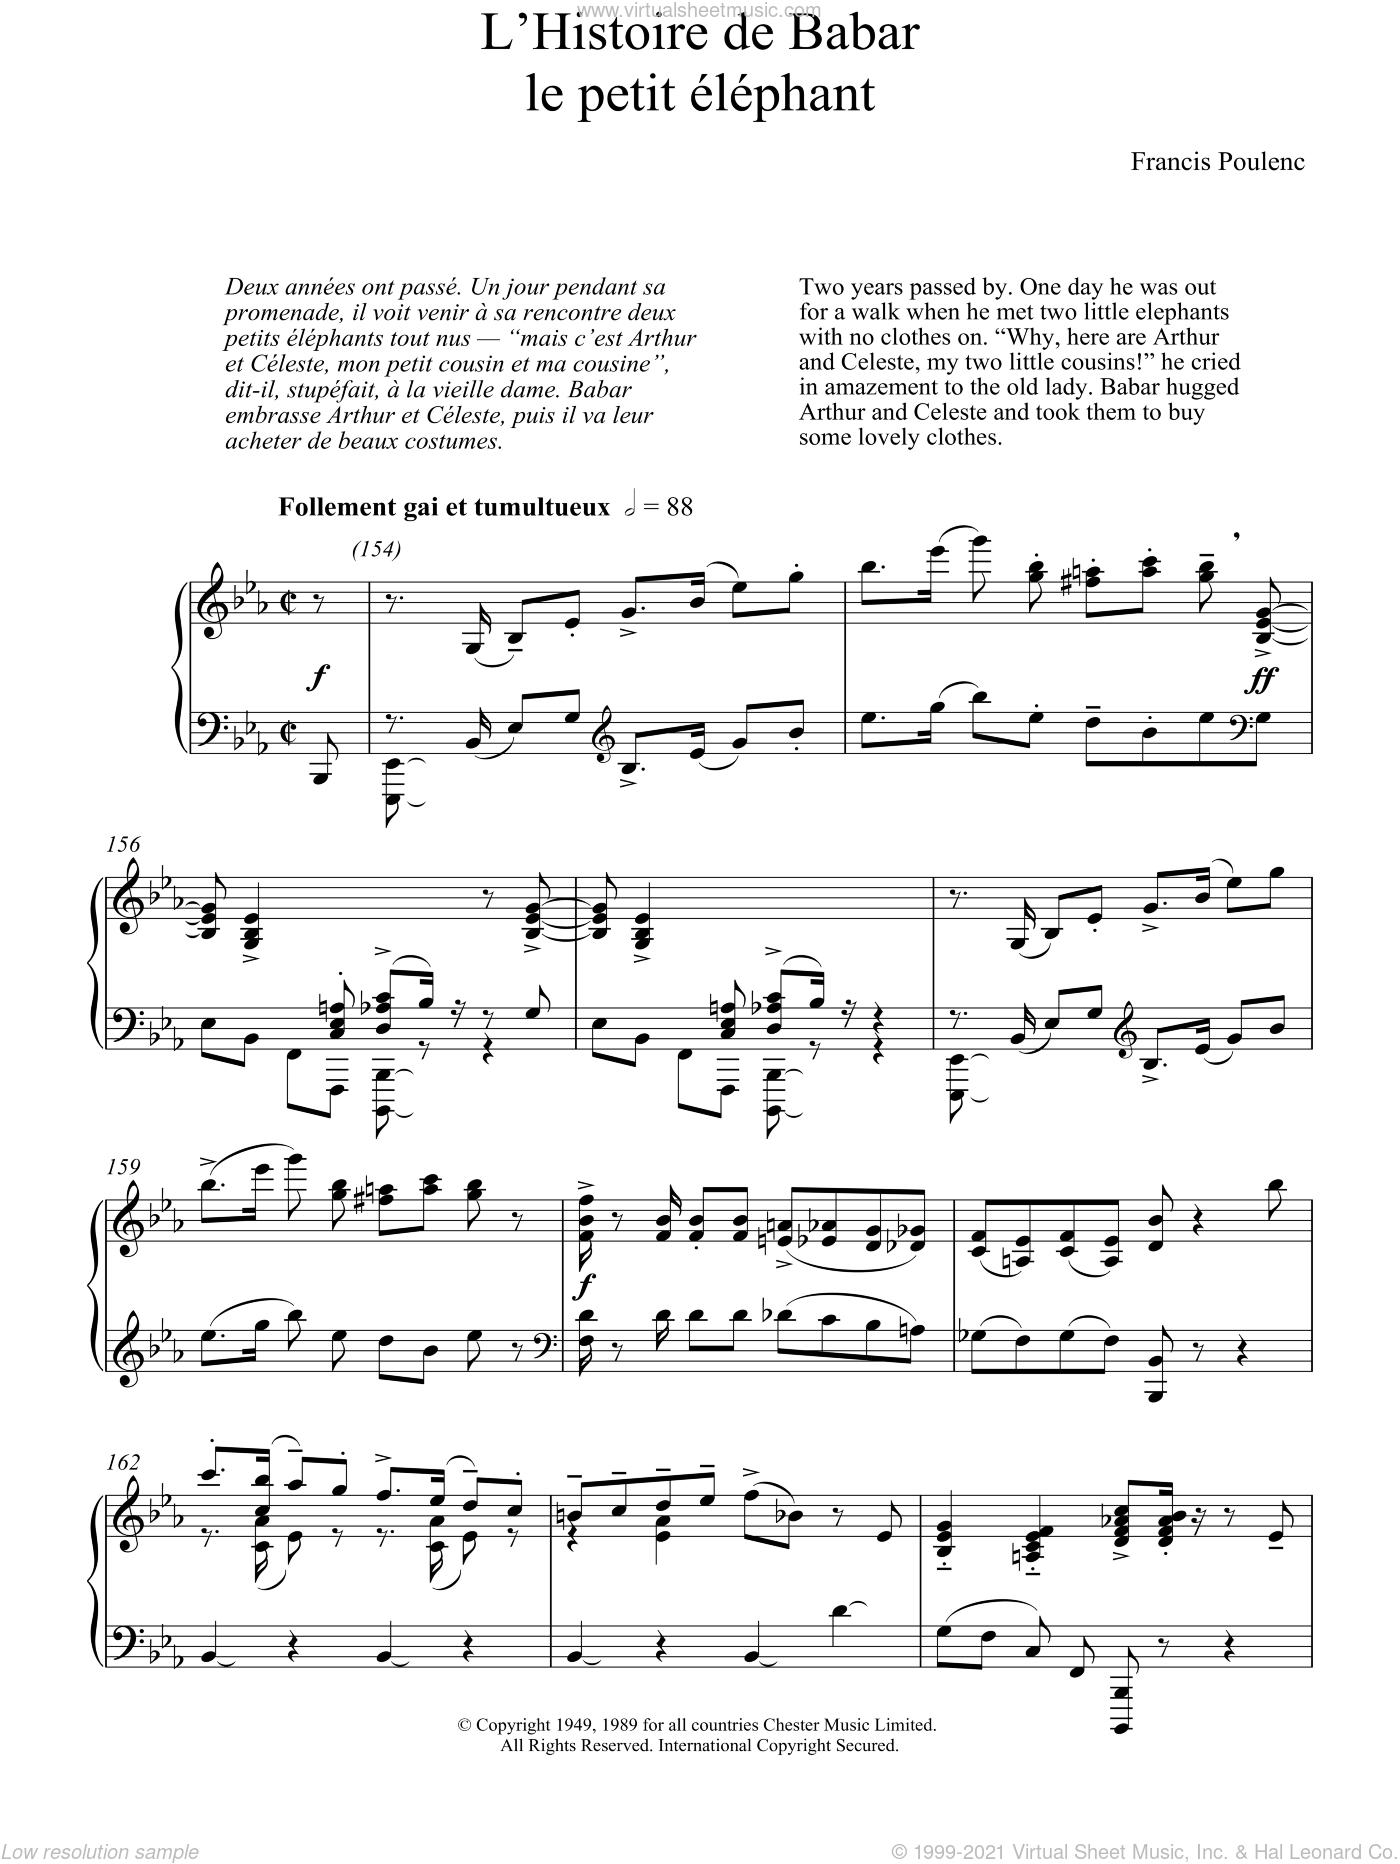 L'Histoire De Babar sheet music for piano solo by Francis Poulenc, classical score, intermediate skill level